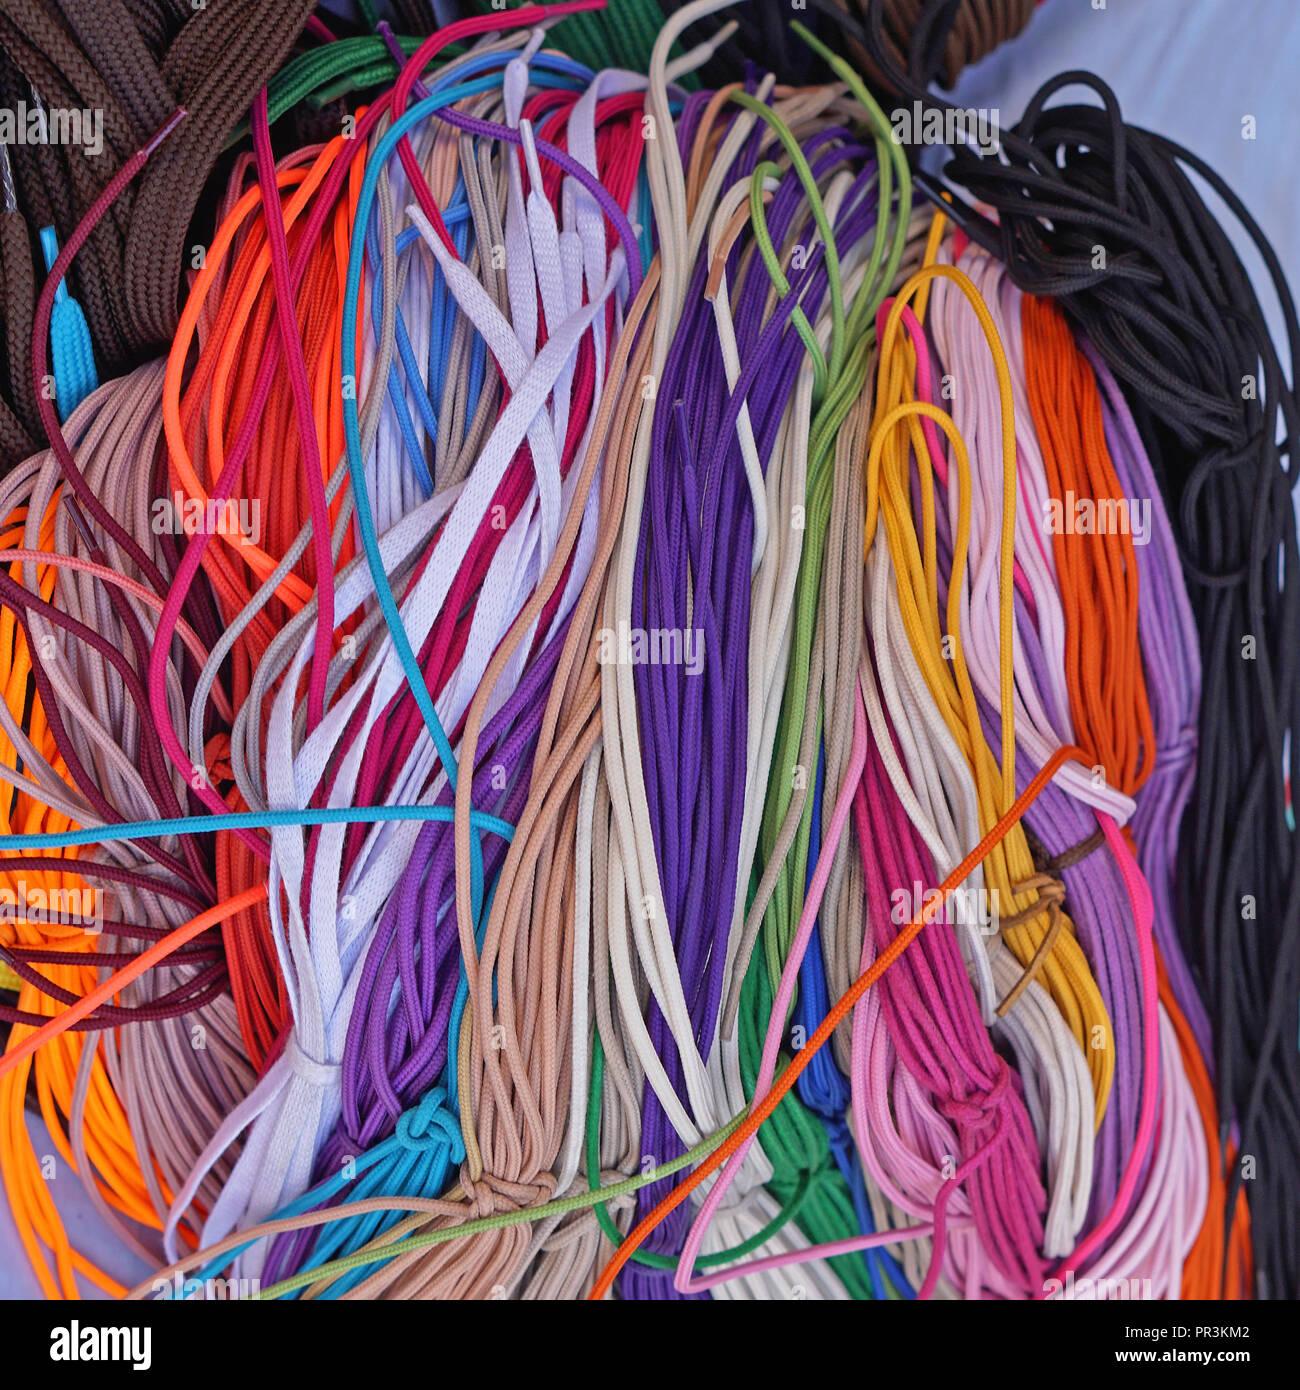 cf6f5d148dc902 Große Haufen neue farbige Schnürsenkel Strings Stockfoto